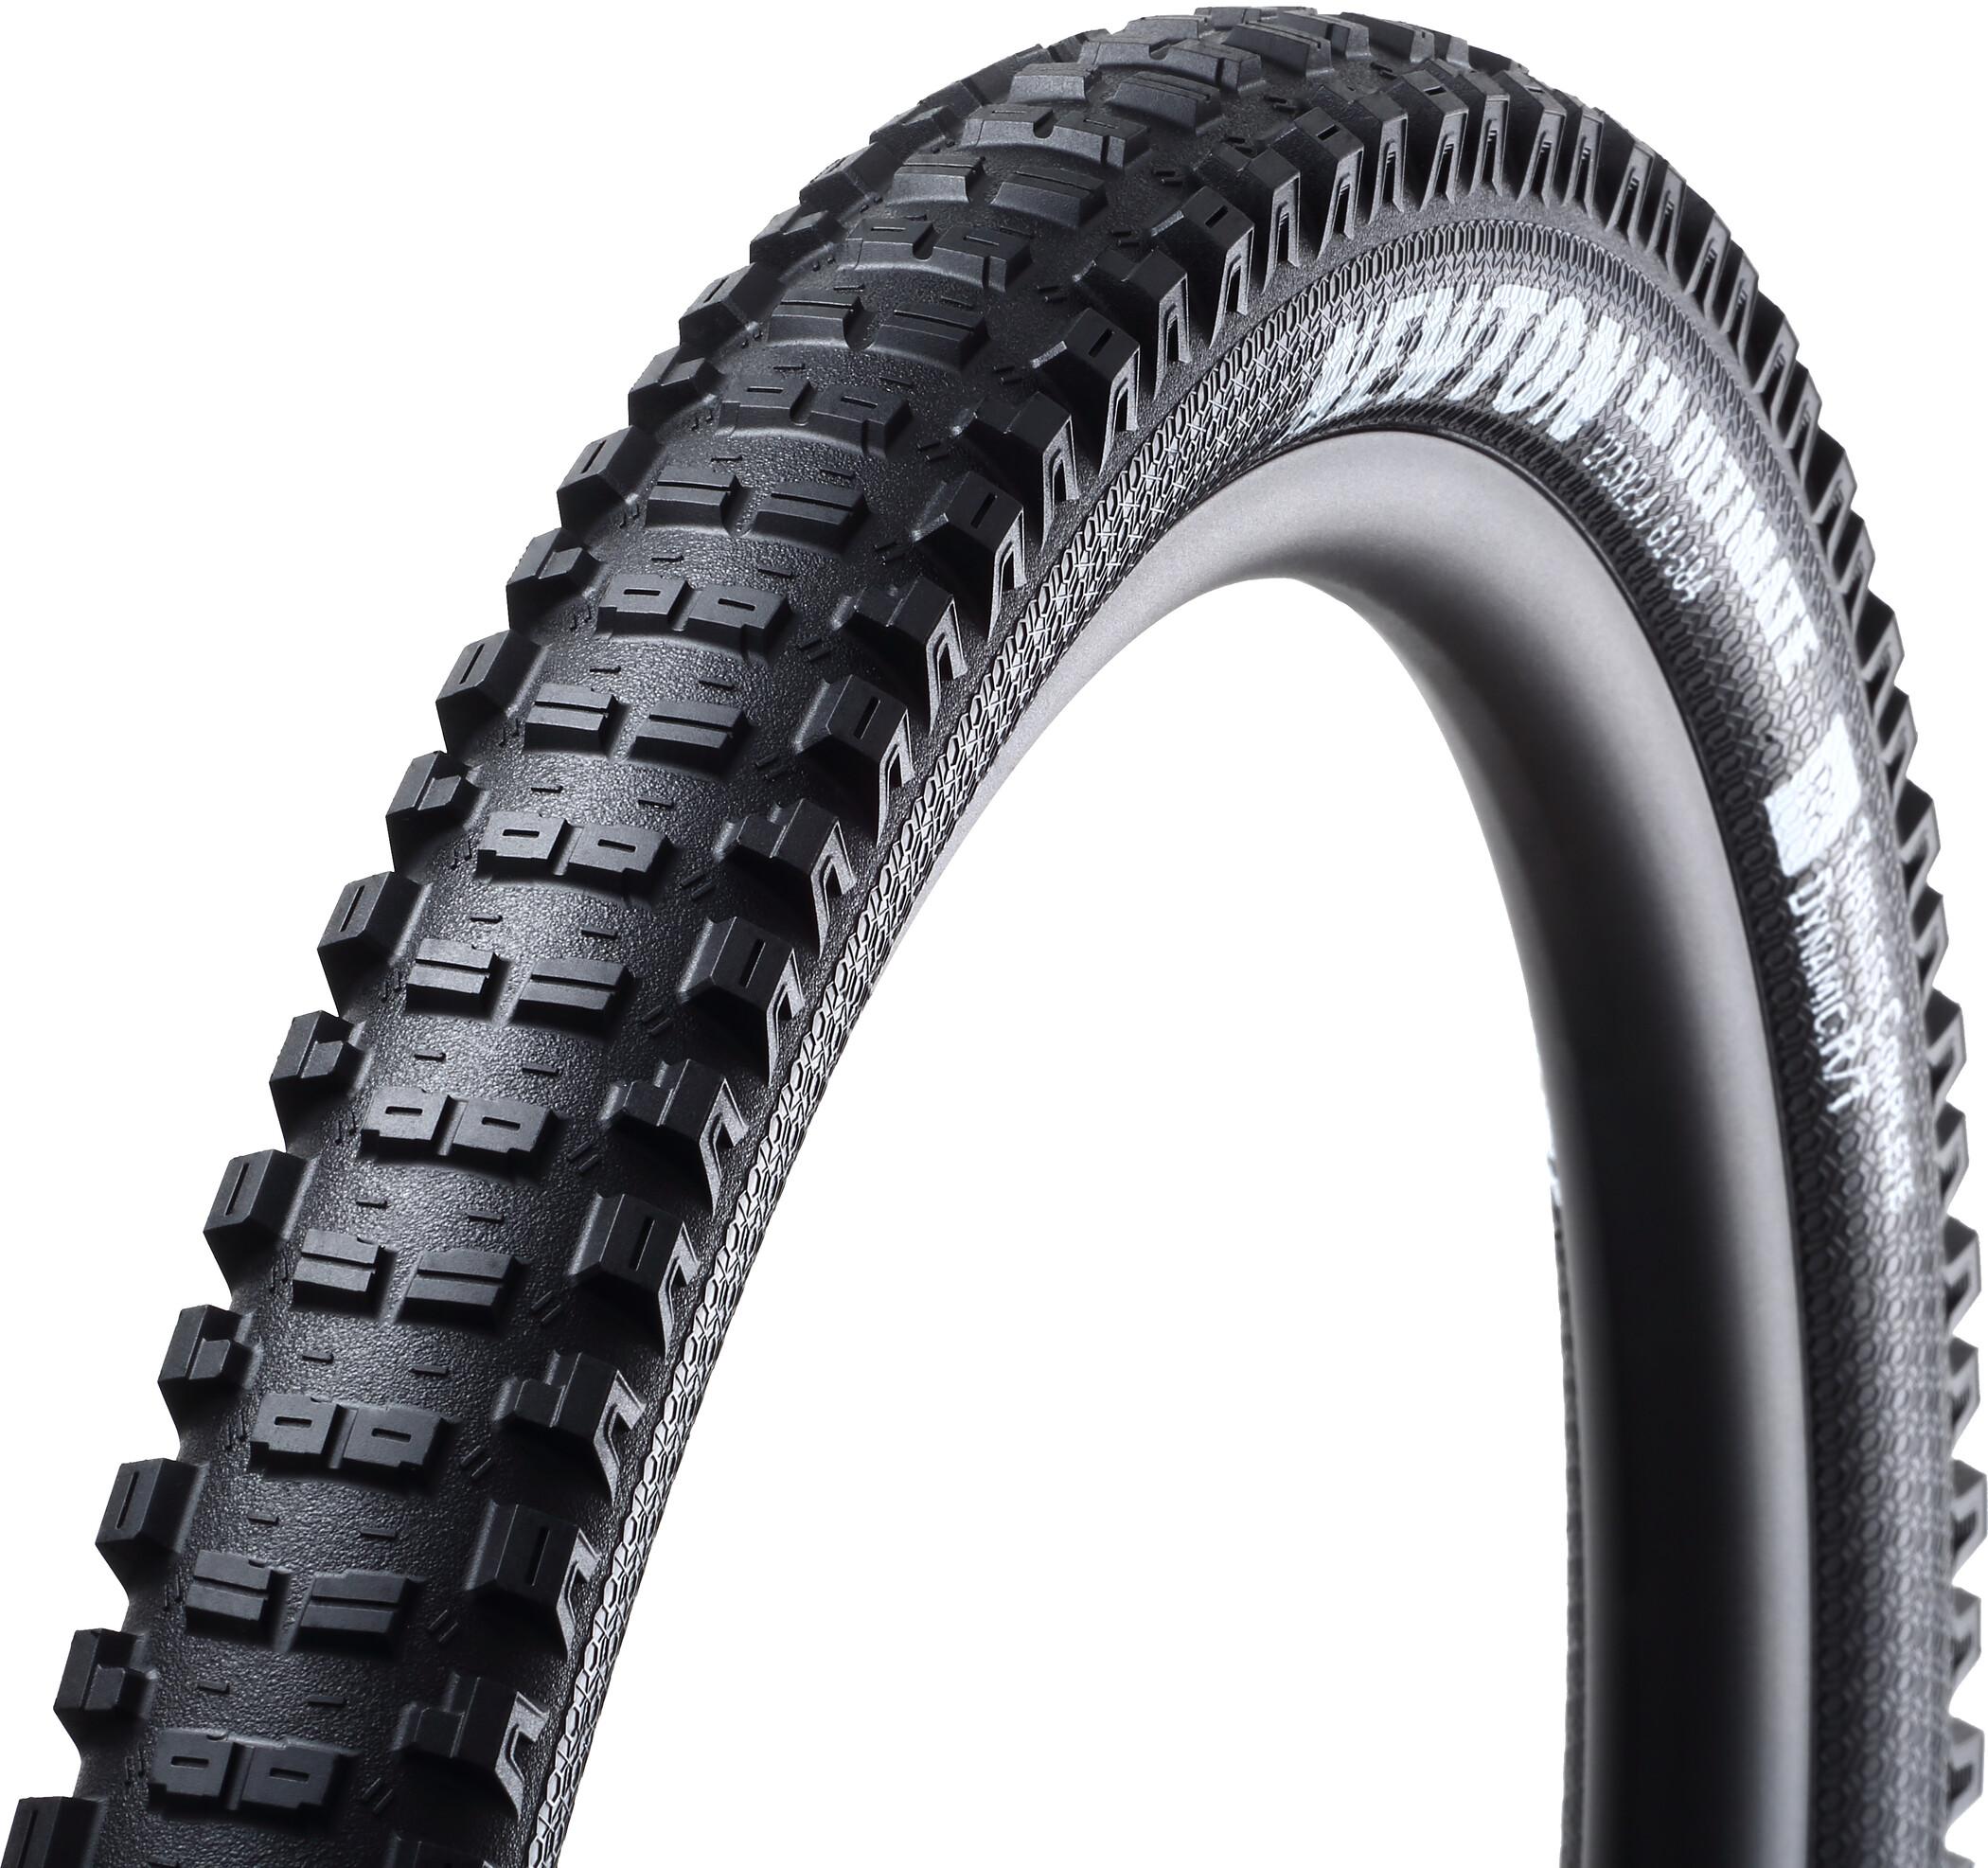 Goodyear Newton EN Ultimate Foldedæk 61-584 Tubeless Complete Dynamic R/T e25, black (2019)   Tyres